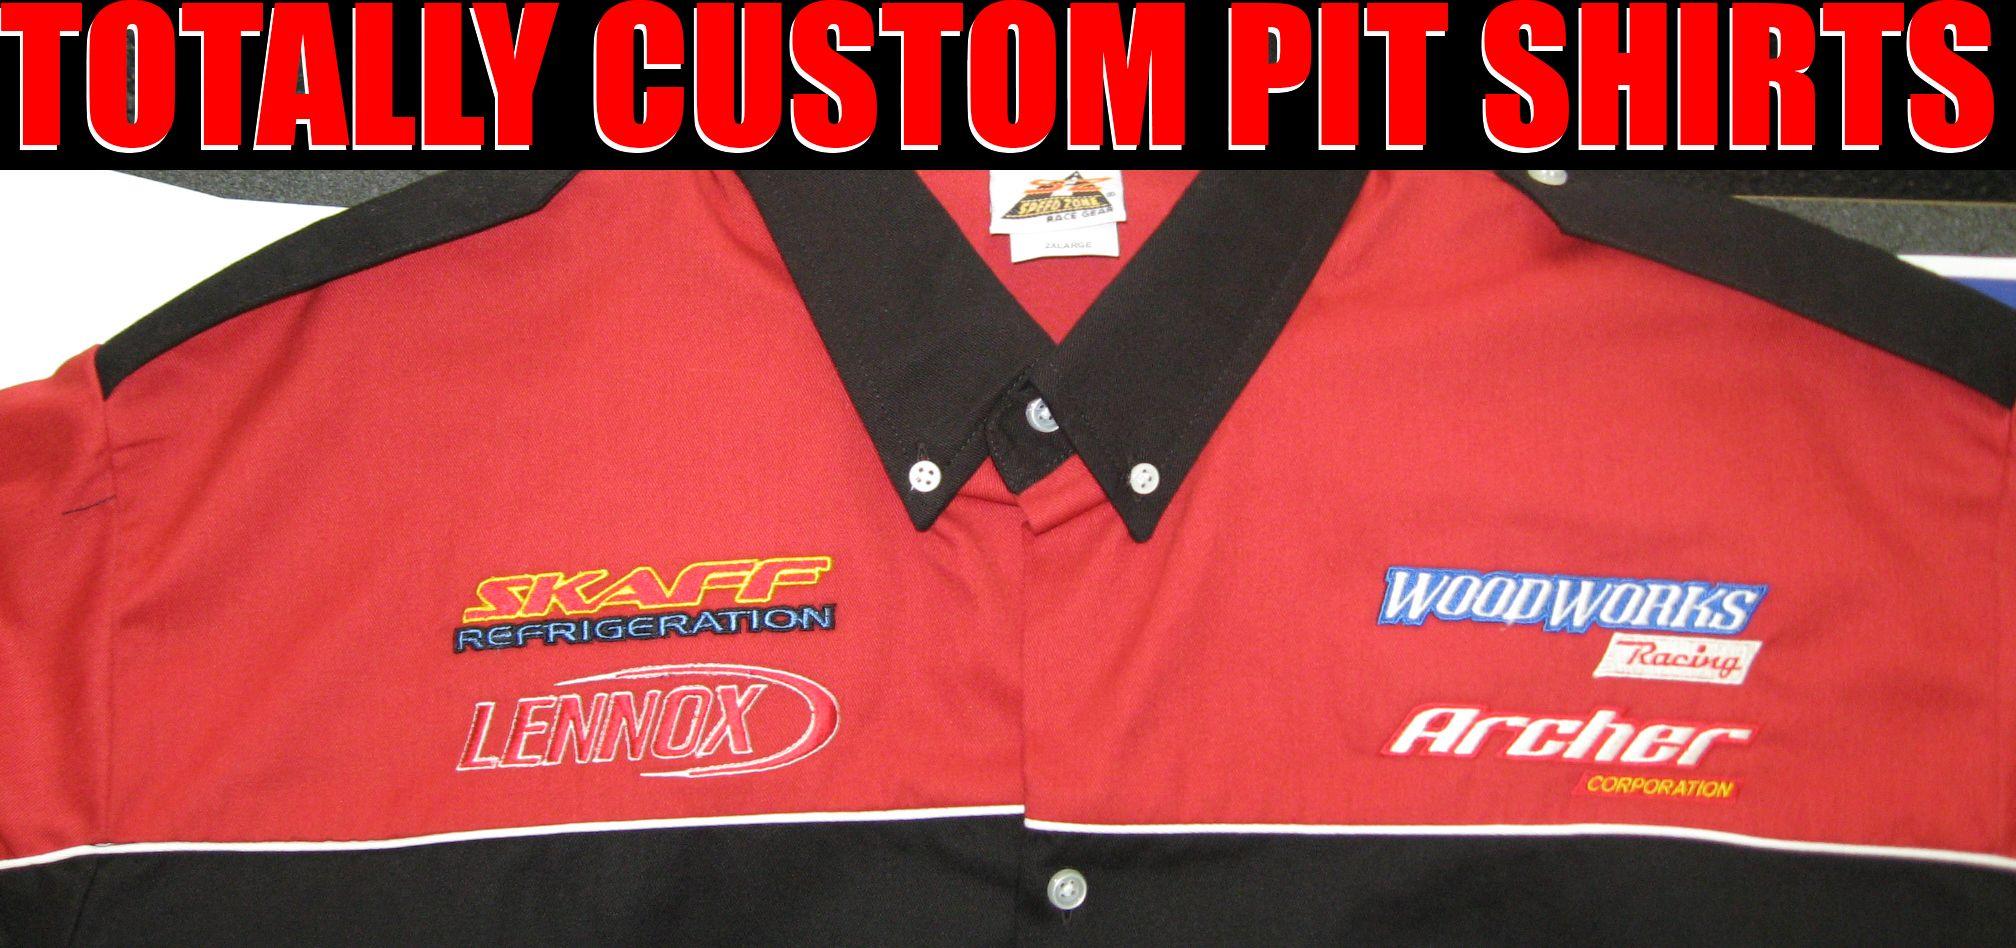 Totally Custom Racing Pit Crew Shirts Mechanic Shirts Caps Pens